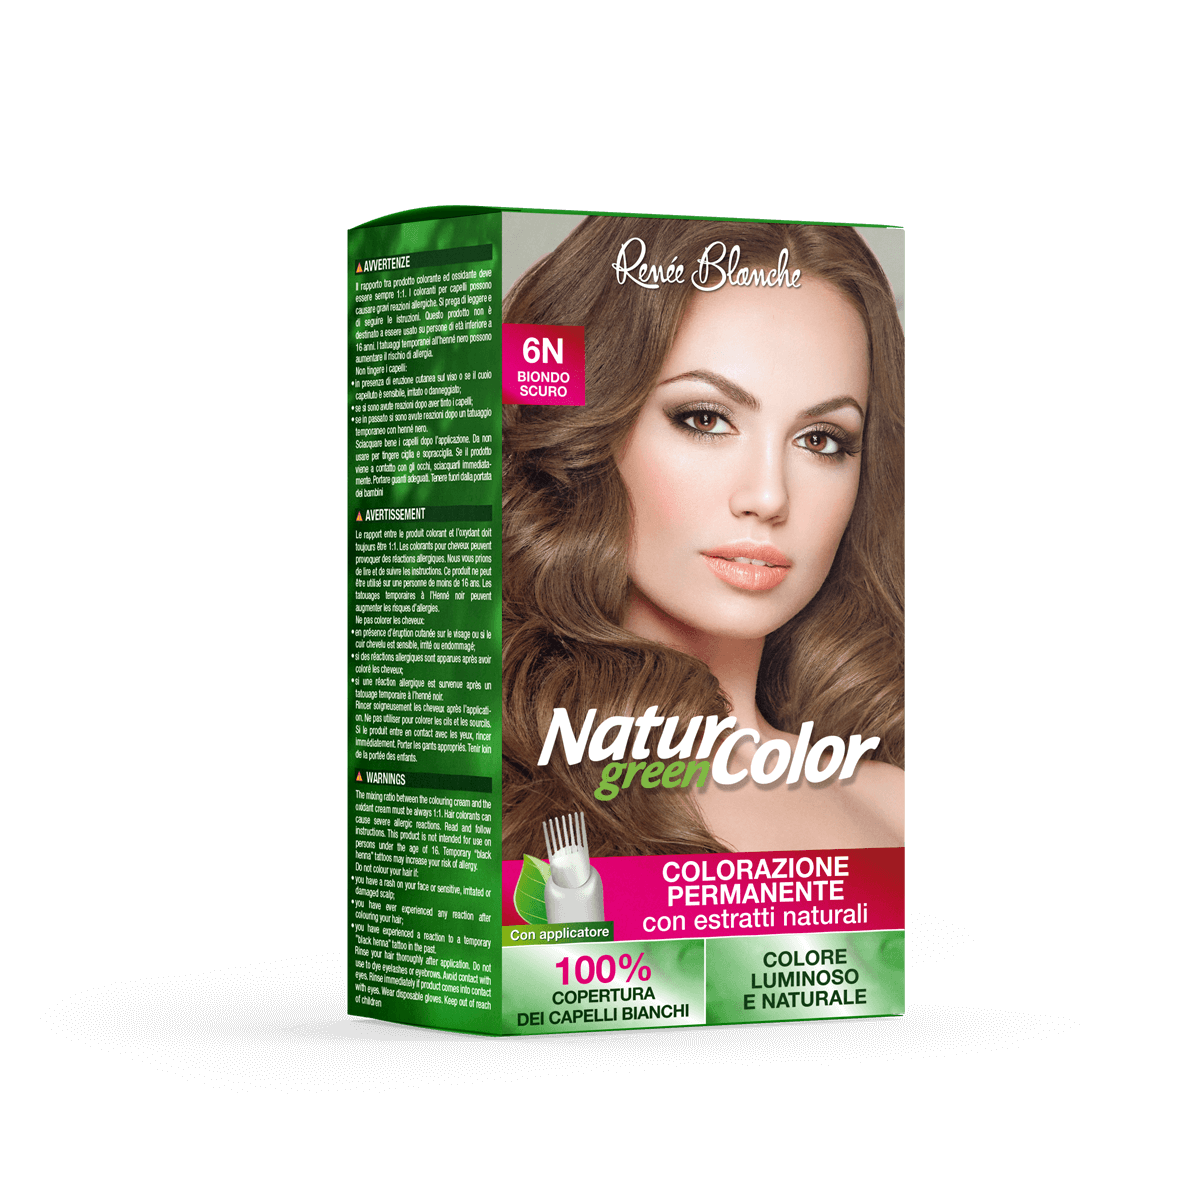 [:it]6N-Biondo-Scuro-Natur-Color[:]